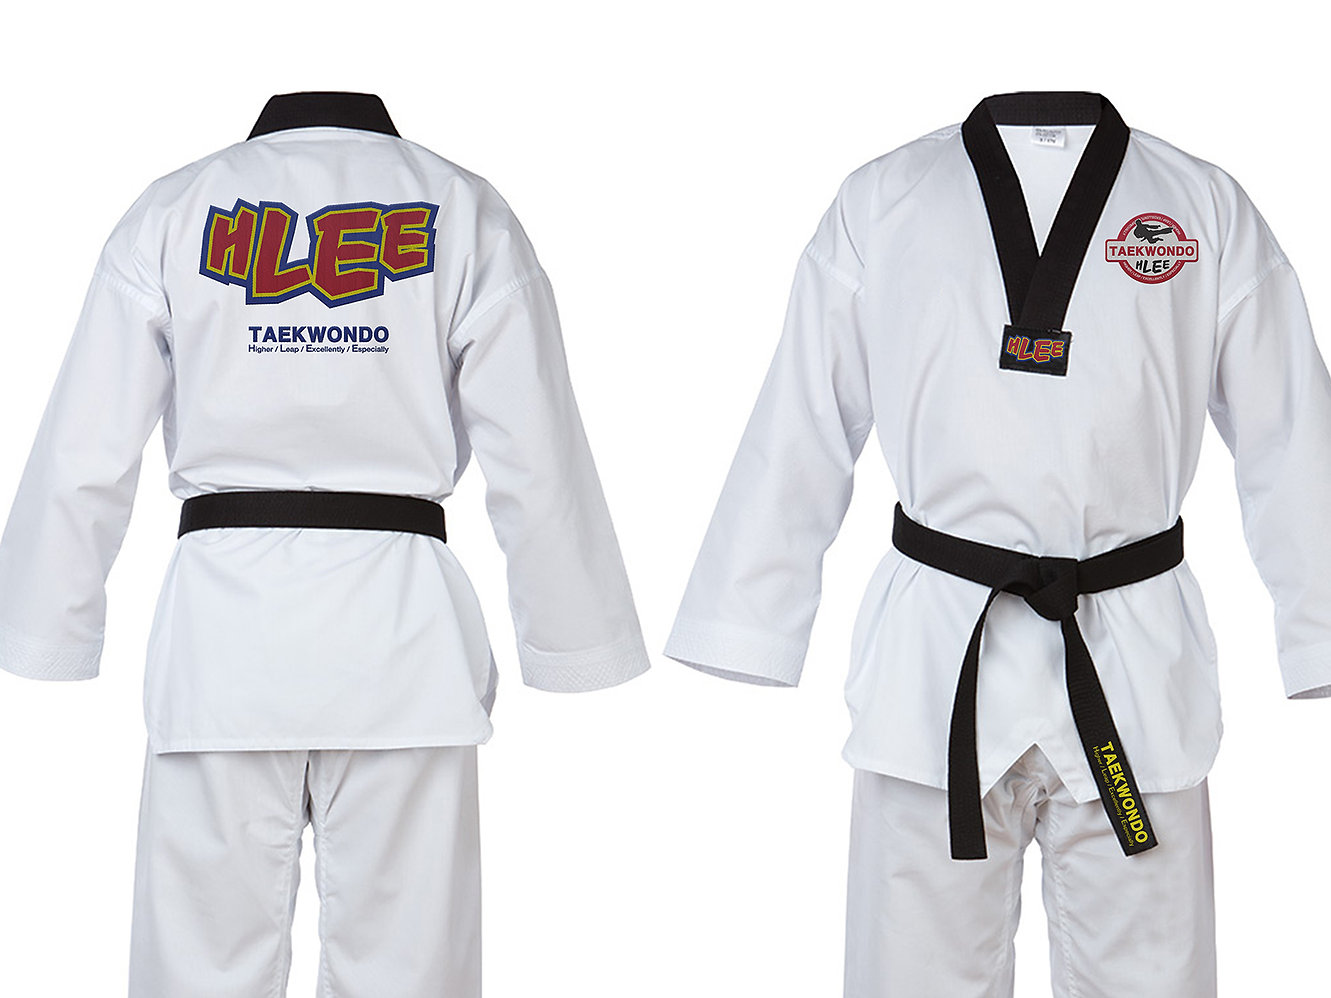 H Lee Taekwondo-Logo Design